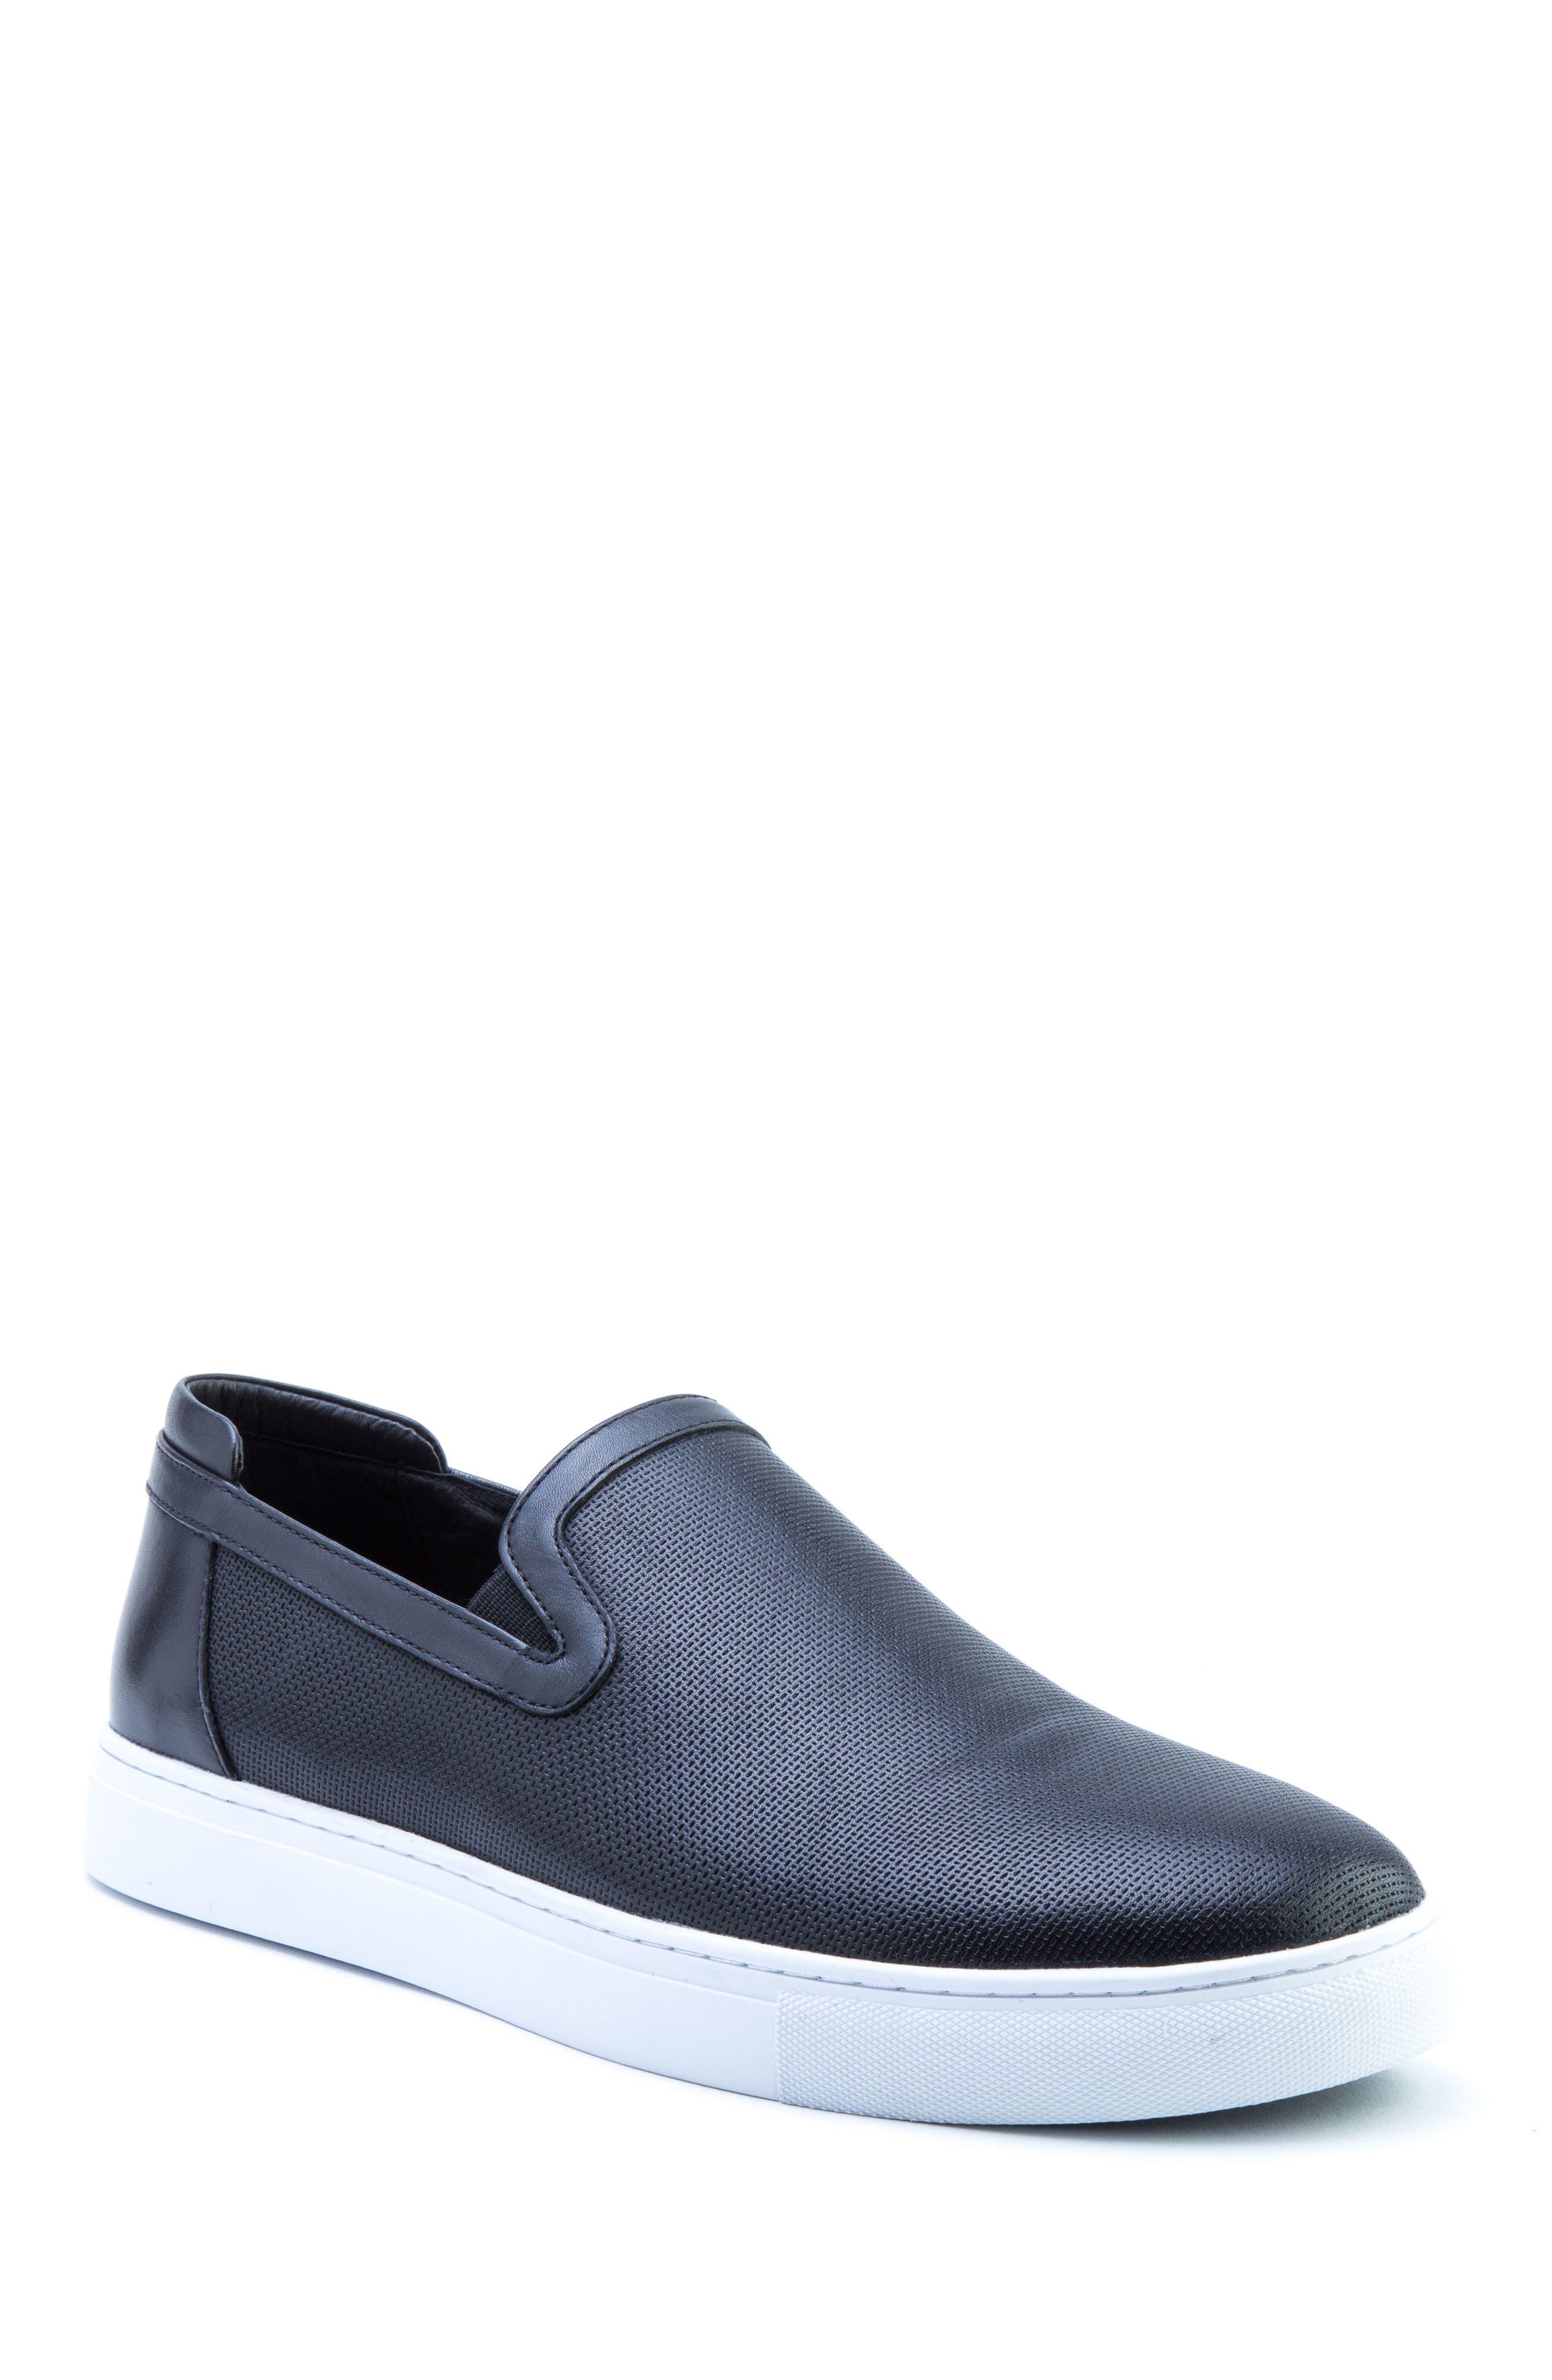 Grant Sneaker,                         Main,                         color, BLACK LEATHER